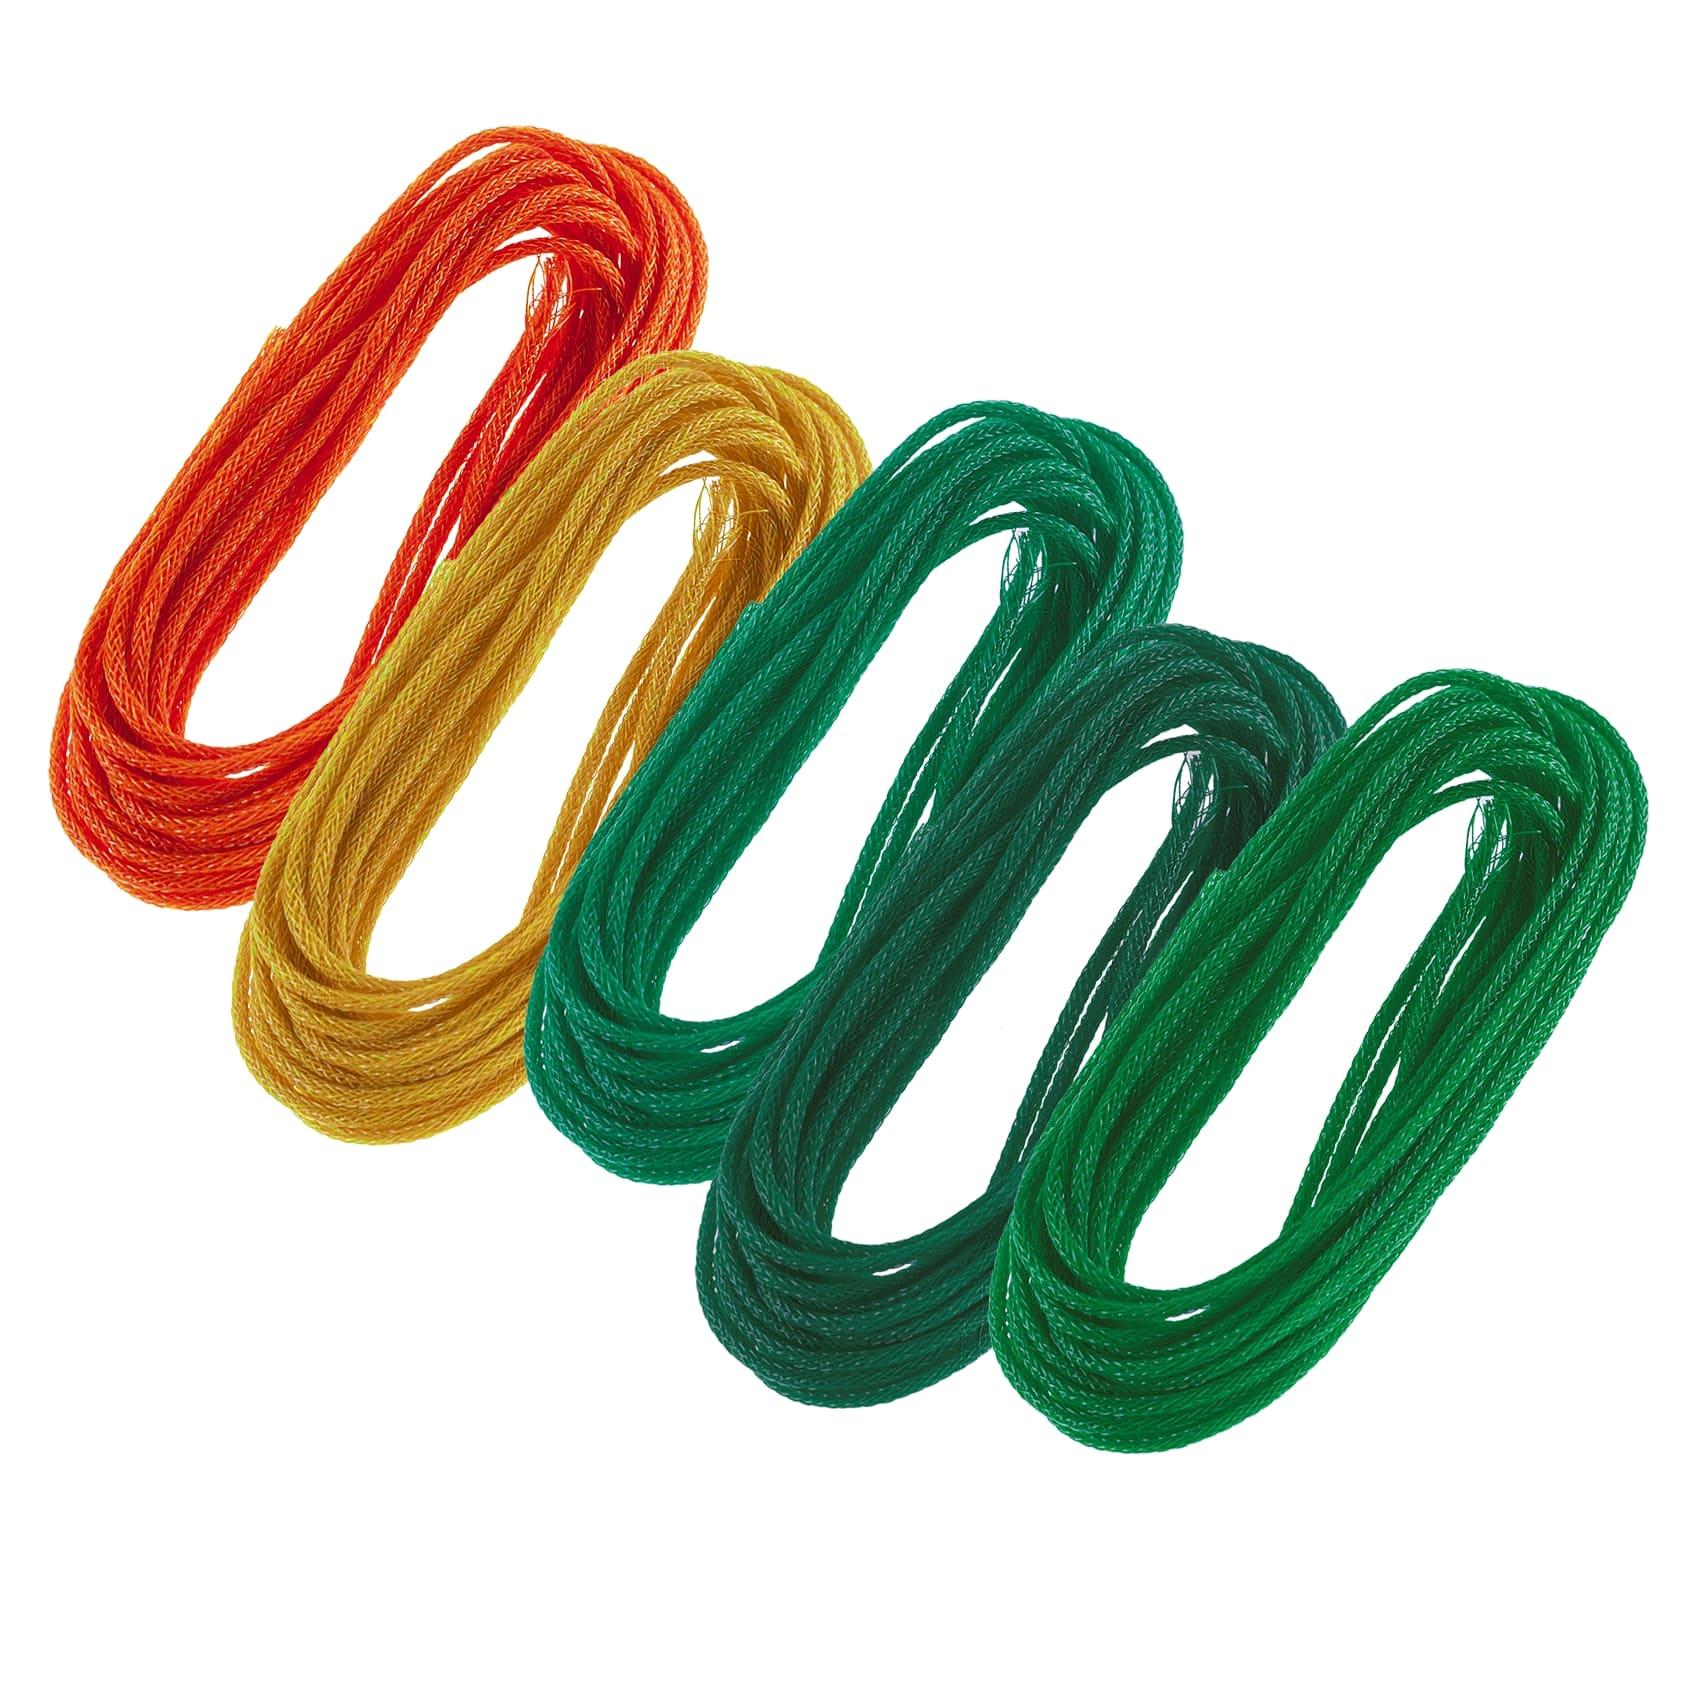 Corda para Varal Nylon N,02, 5 peças de 10m